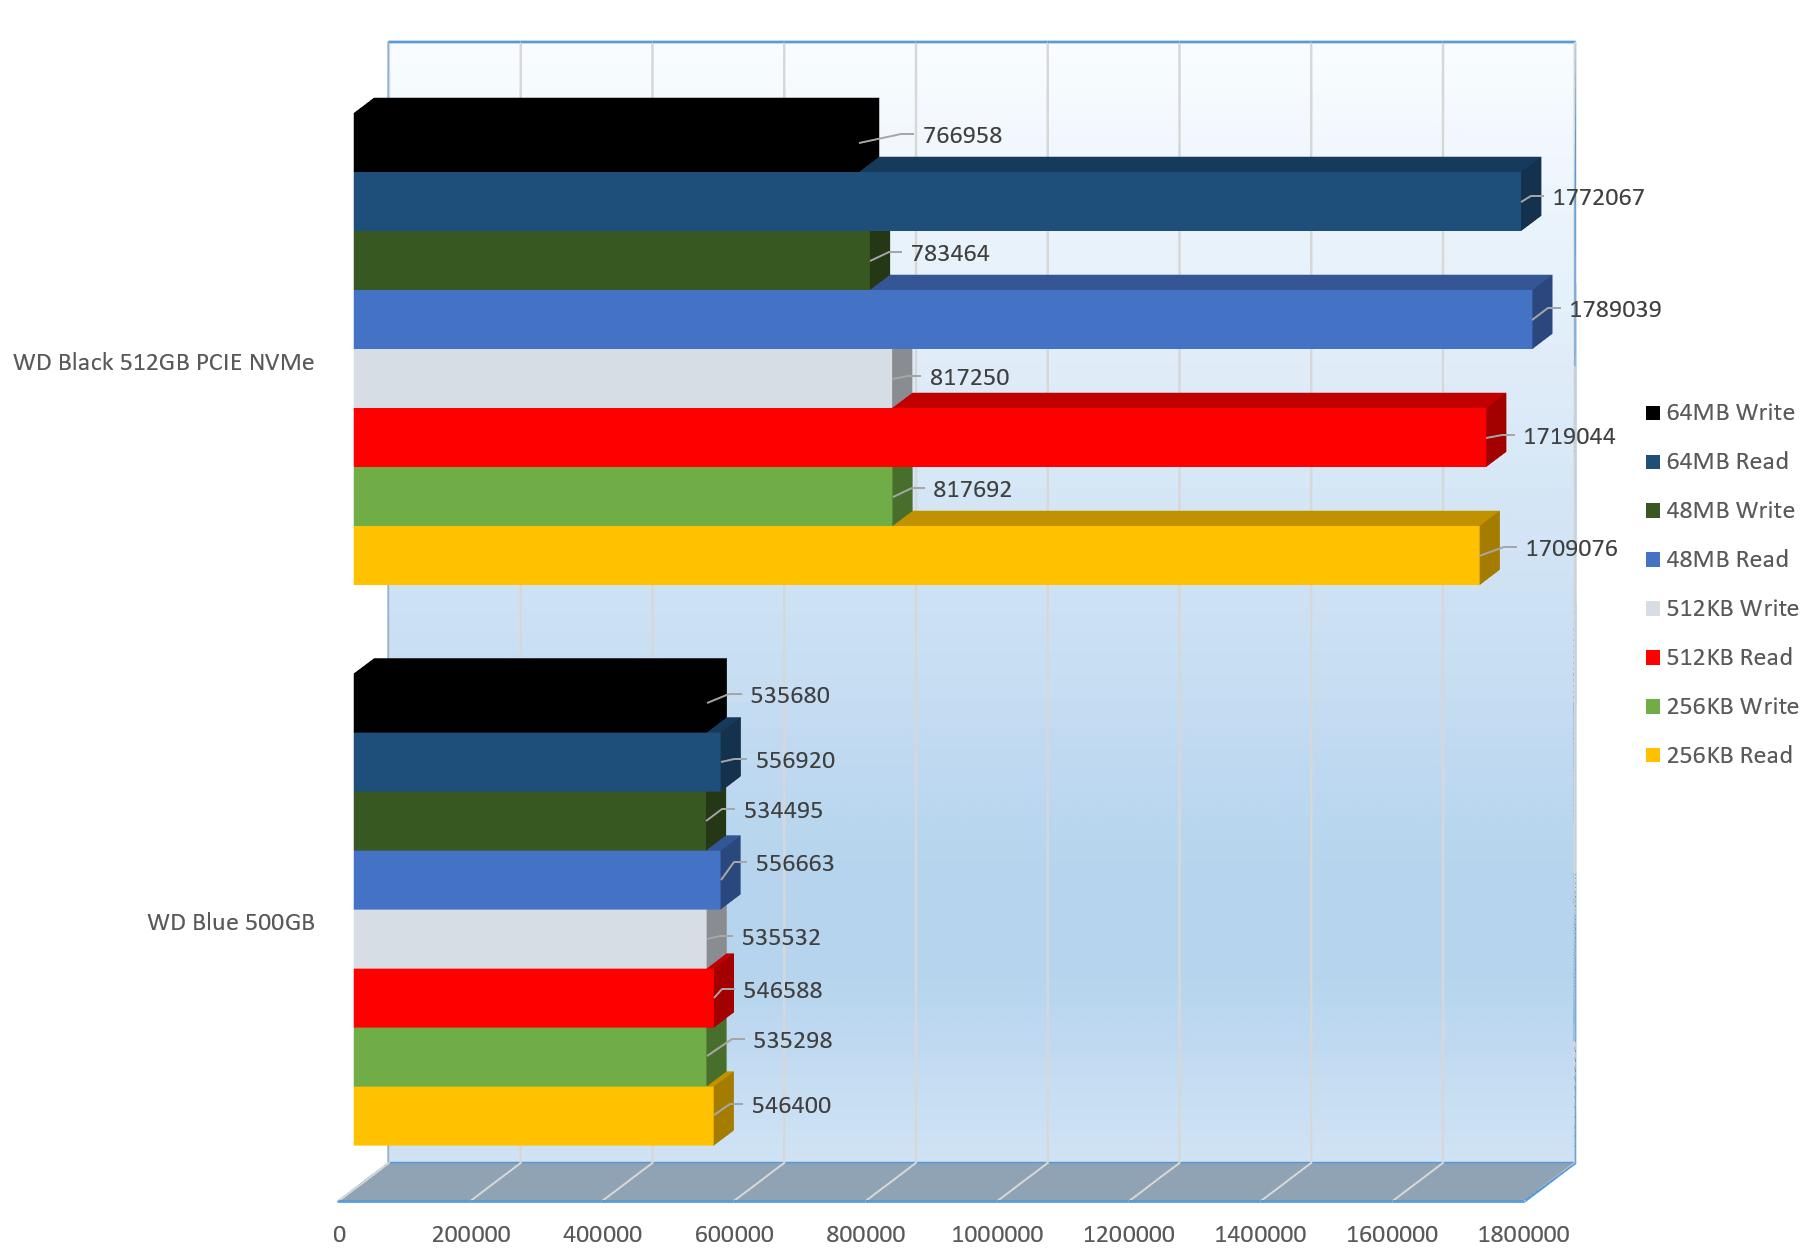 WD Black 512GB PCIE NVMe SSD Review - Drive Comparison - Dragon